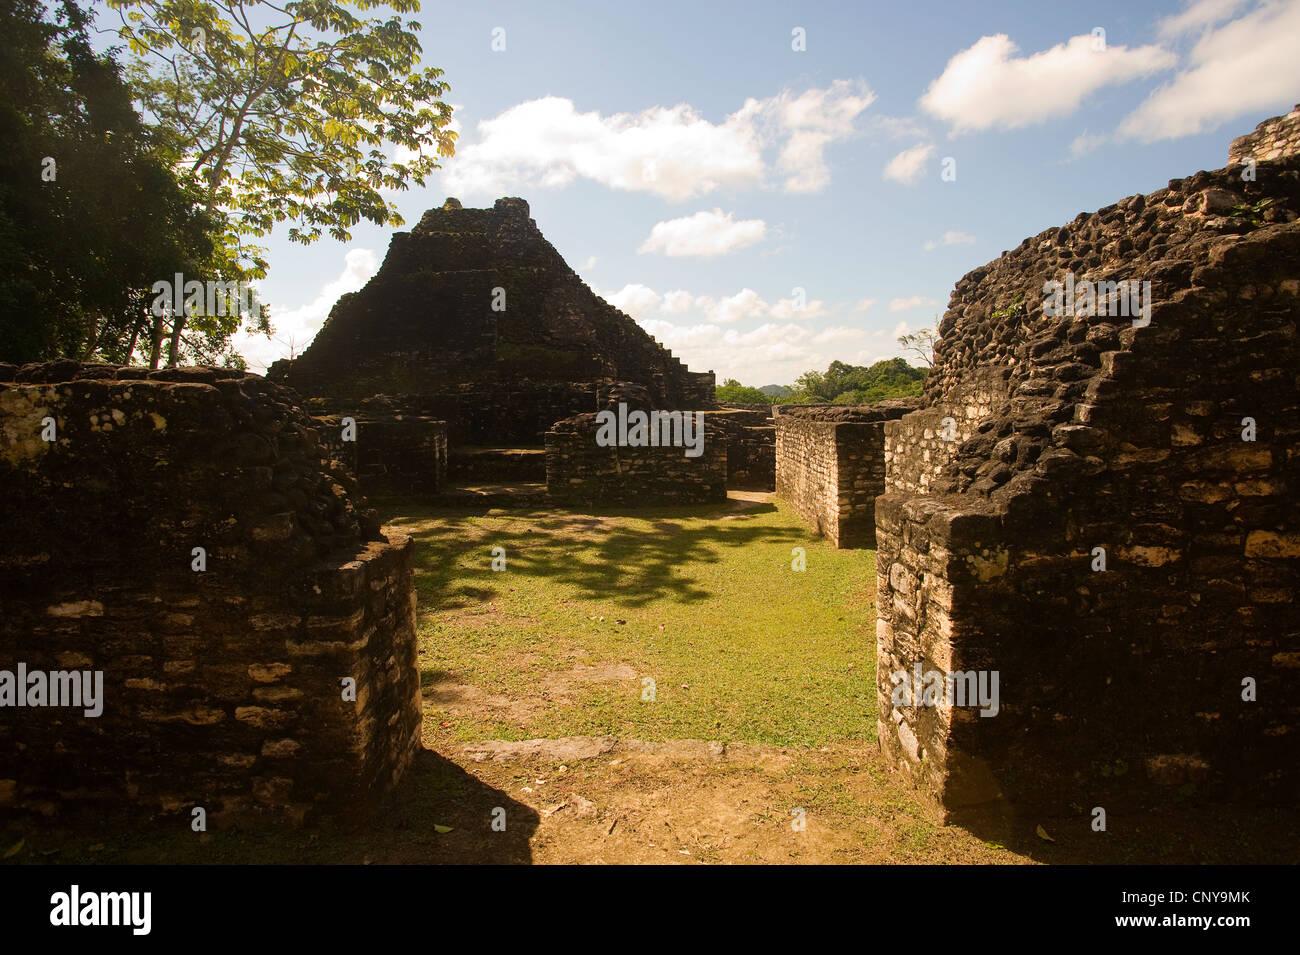 Caracol Maya ruins, belize - Stock Image